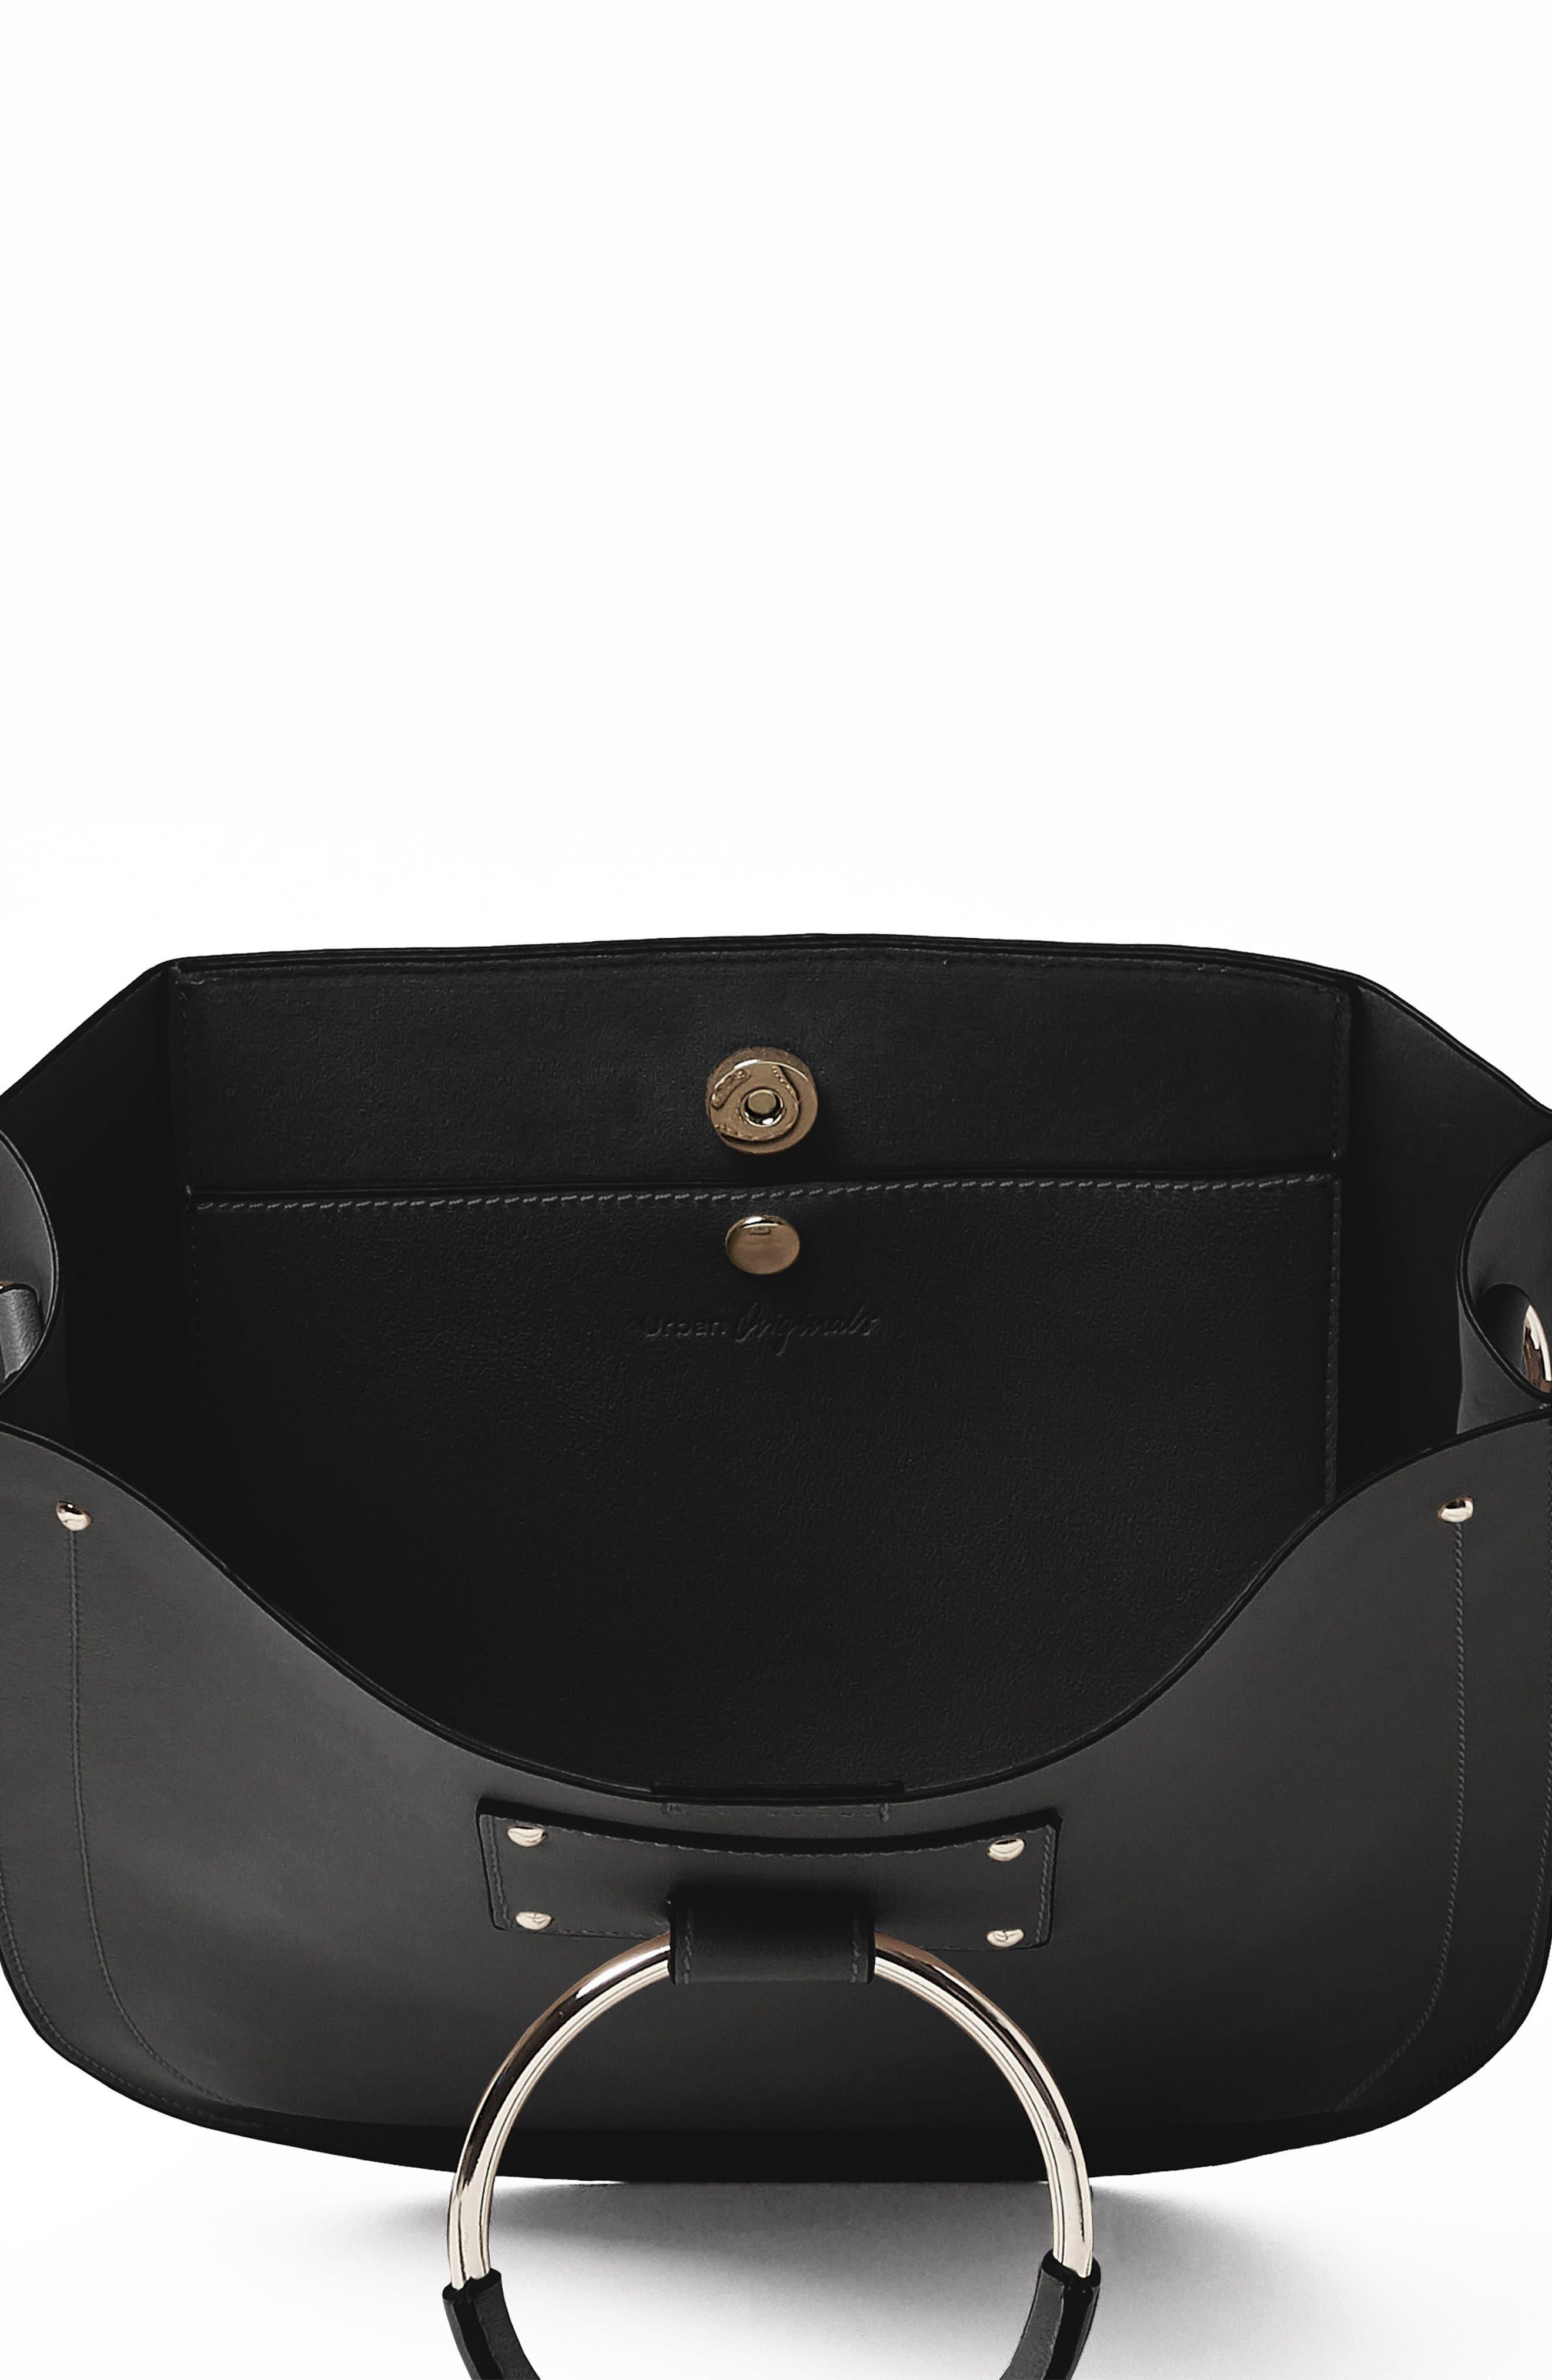 Nordic Dream Vegan Leather Shoulder Bag,                             Alternate thumbnail 2, color,                             Black